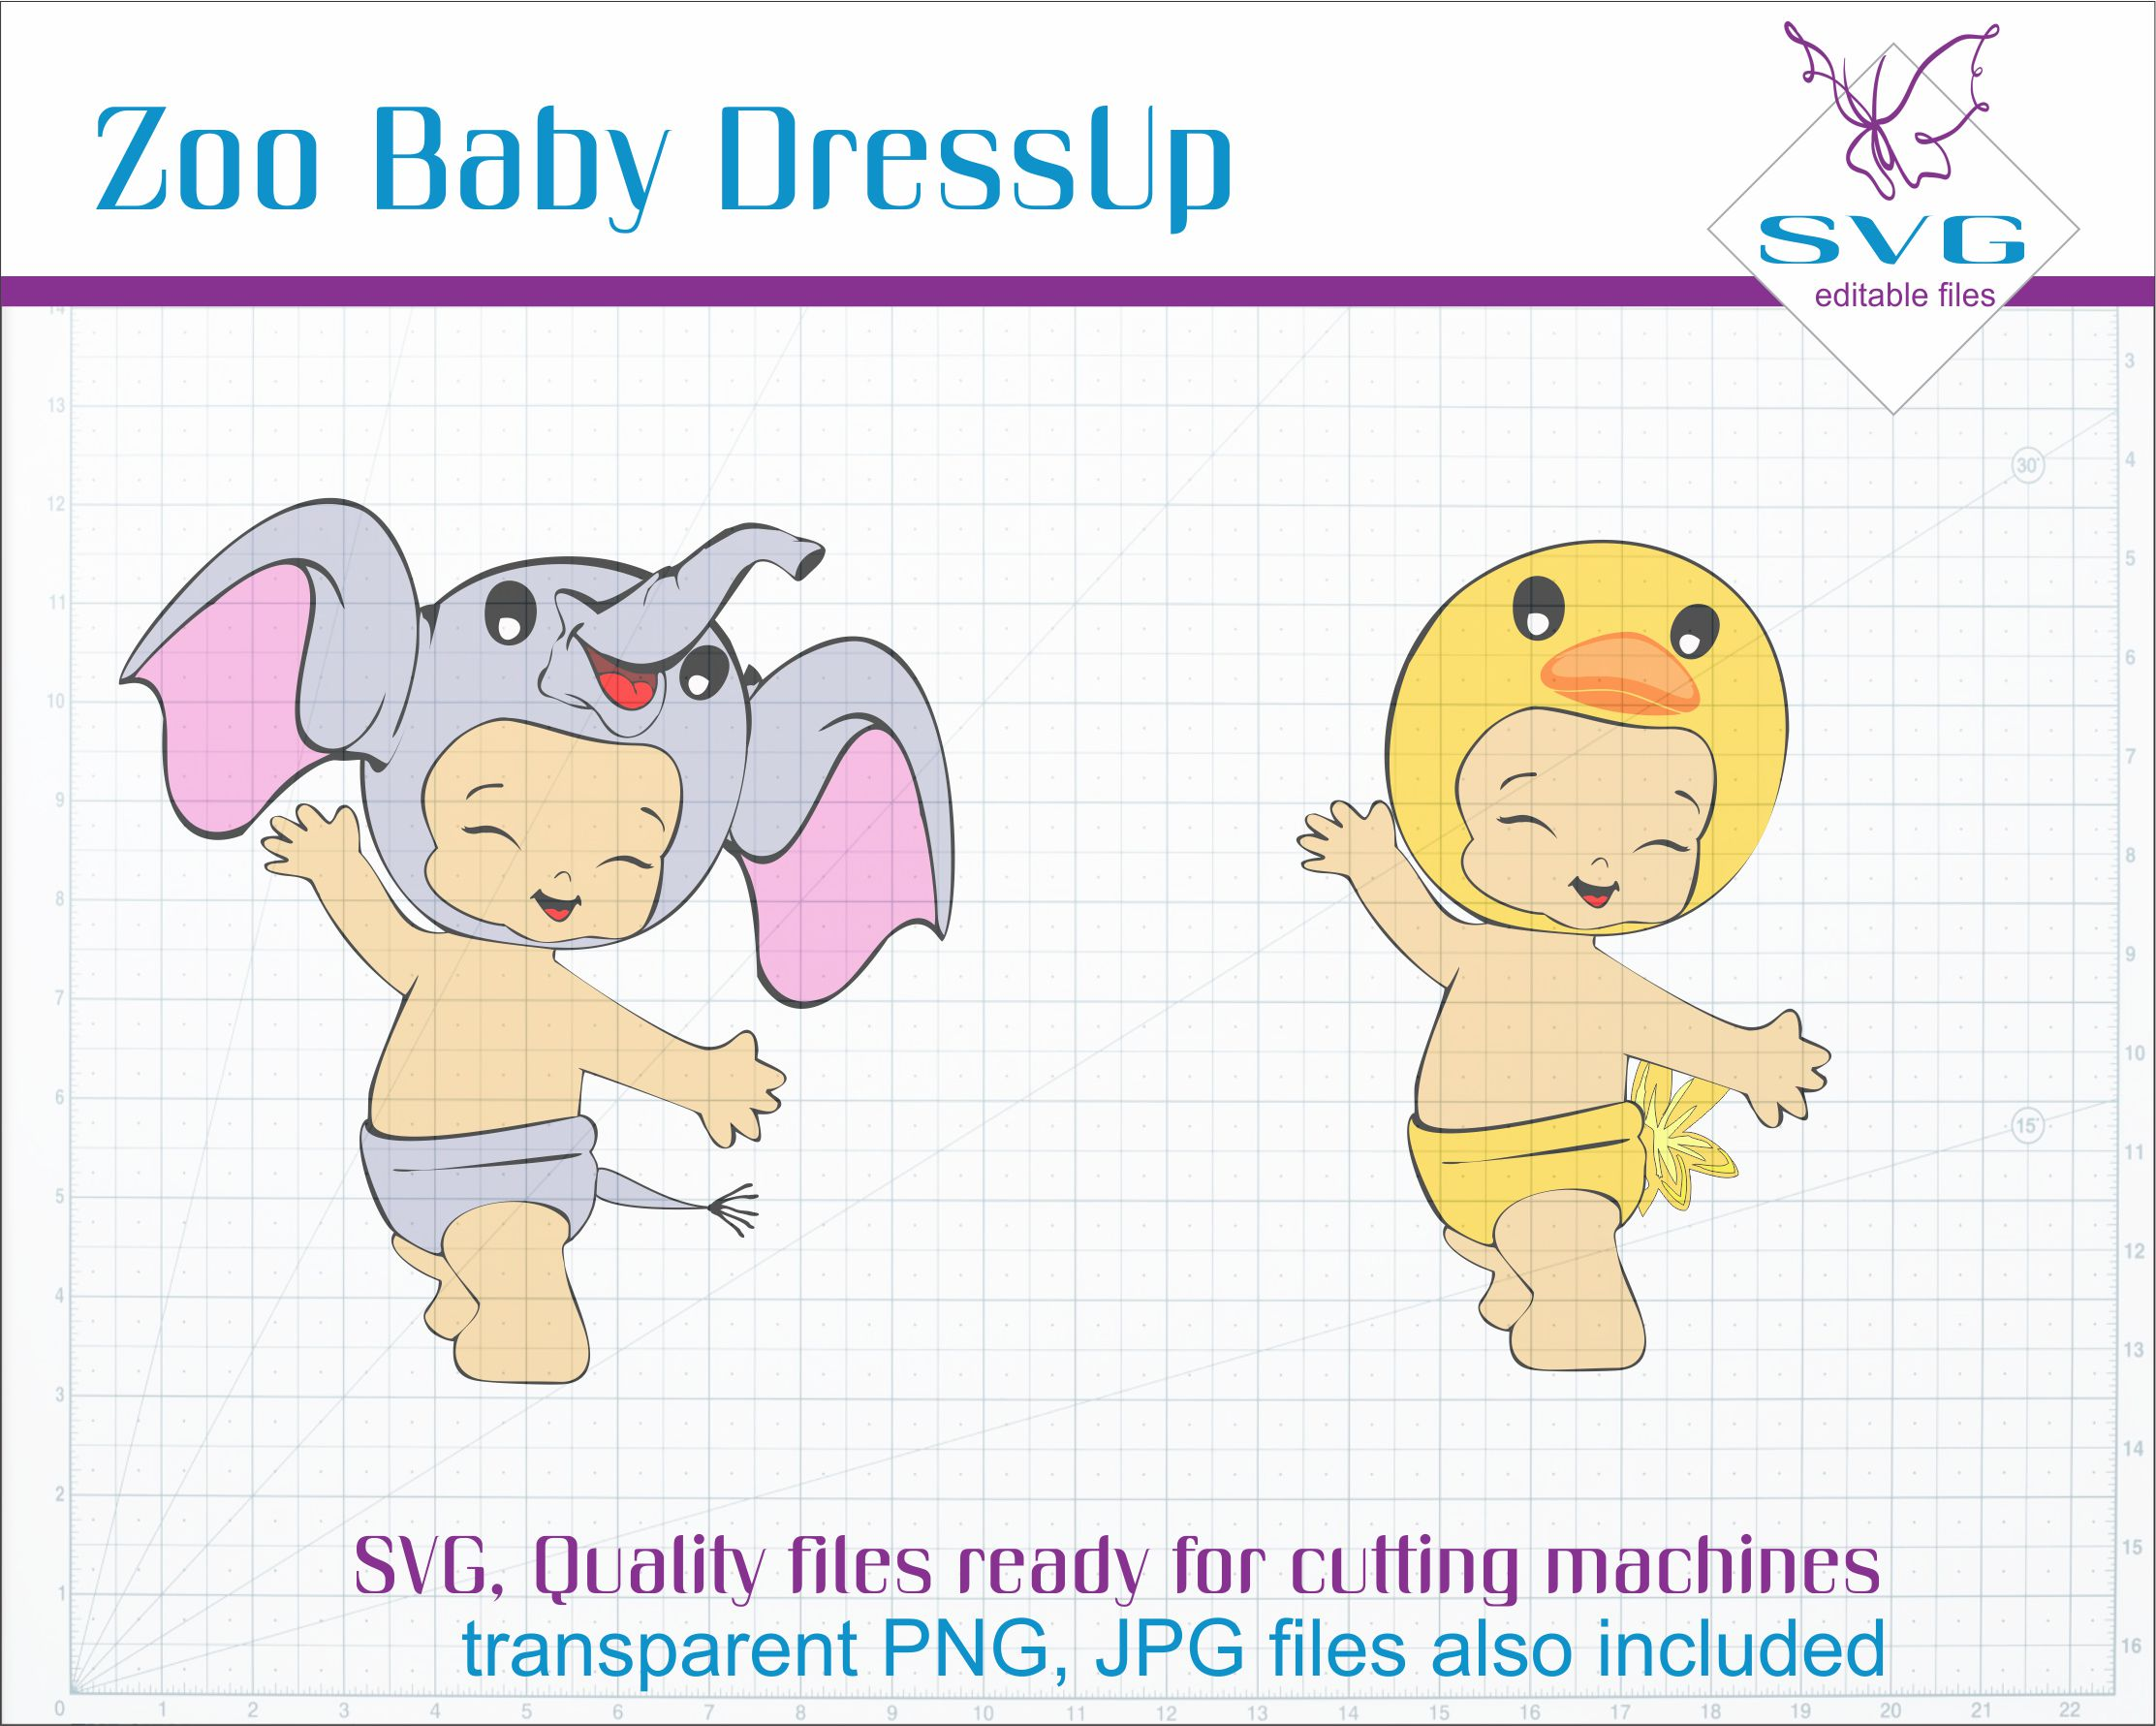 Zoo Baby Dressup example image 5